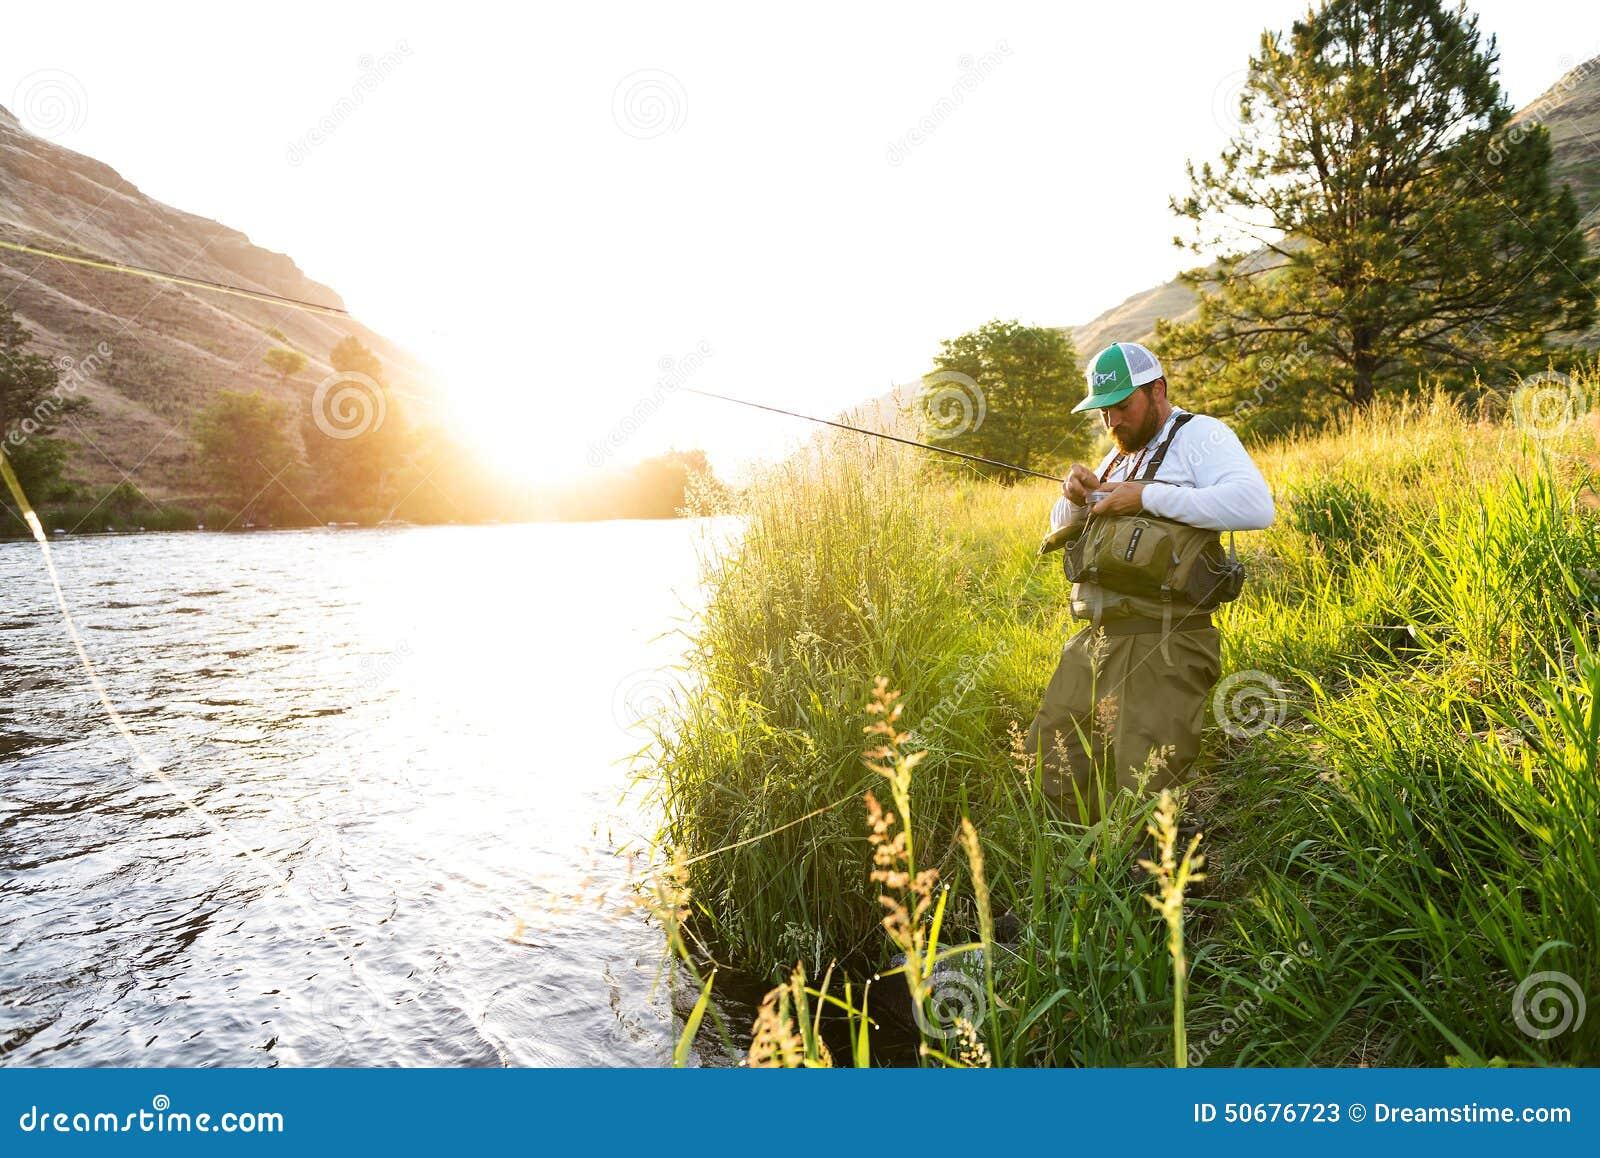 Download 飞行河岸的渔夫在日出 库存图片. 图片 包括有 捕鱼, 业余爱好, 诱剂, 日出, 渔夫, 线路, 飞行 - 50676723